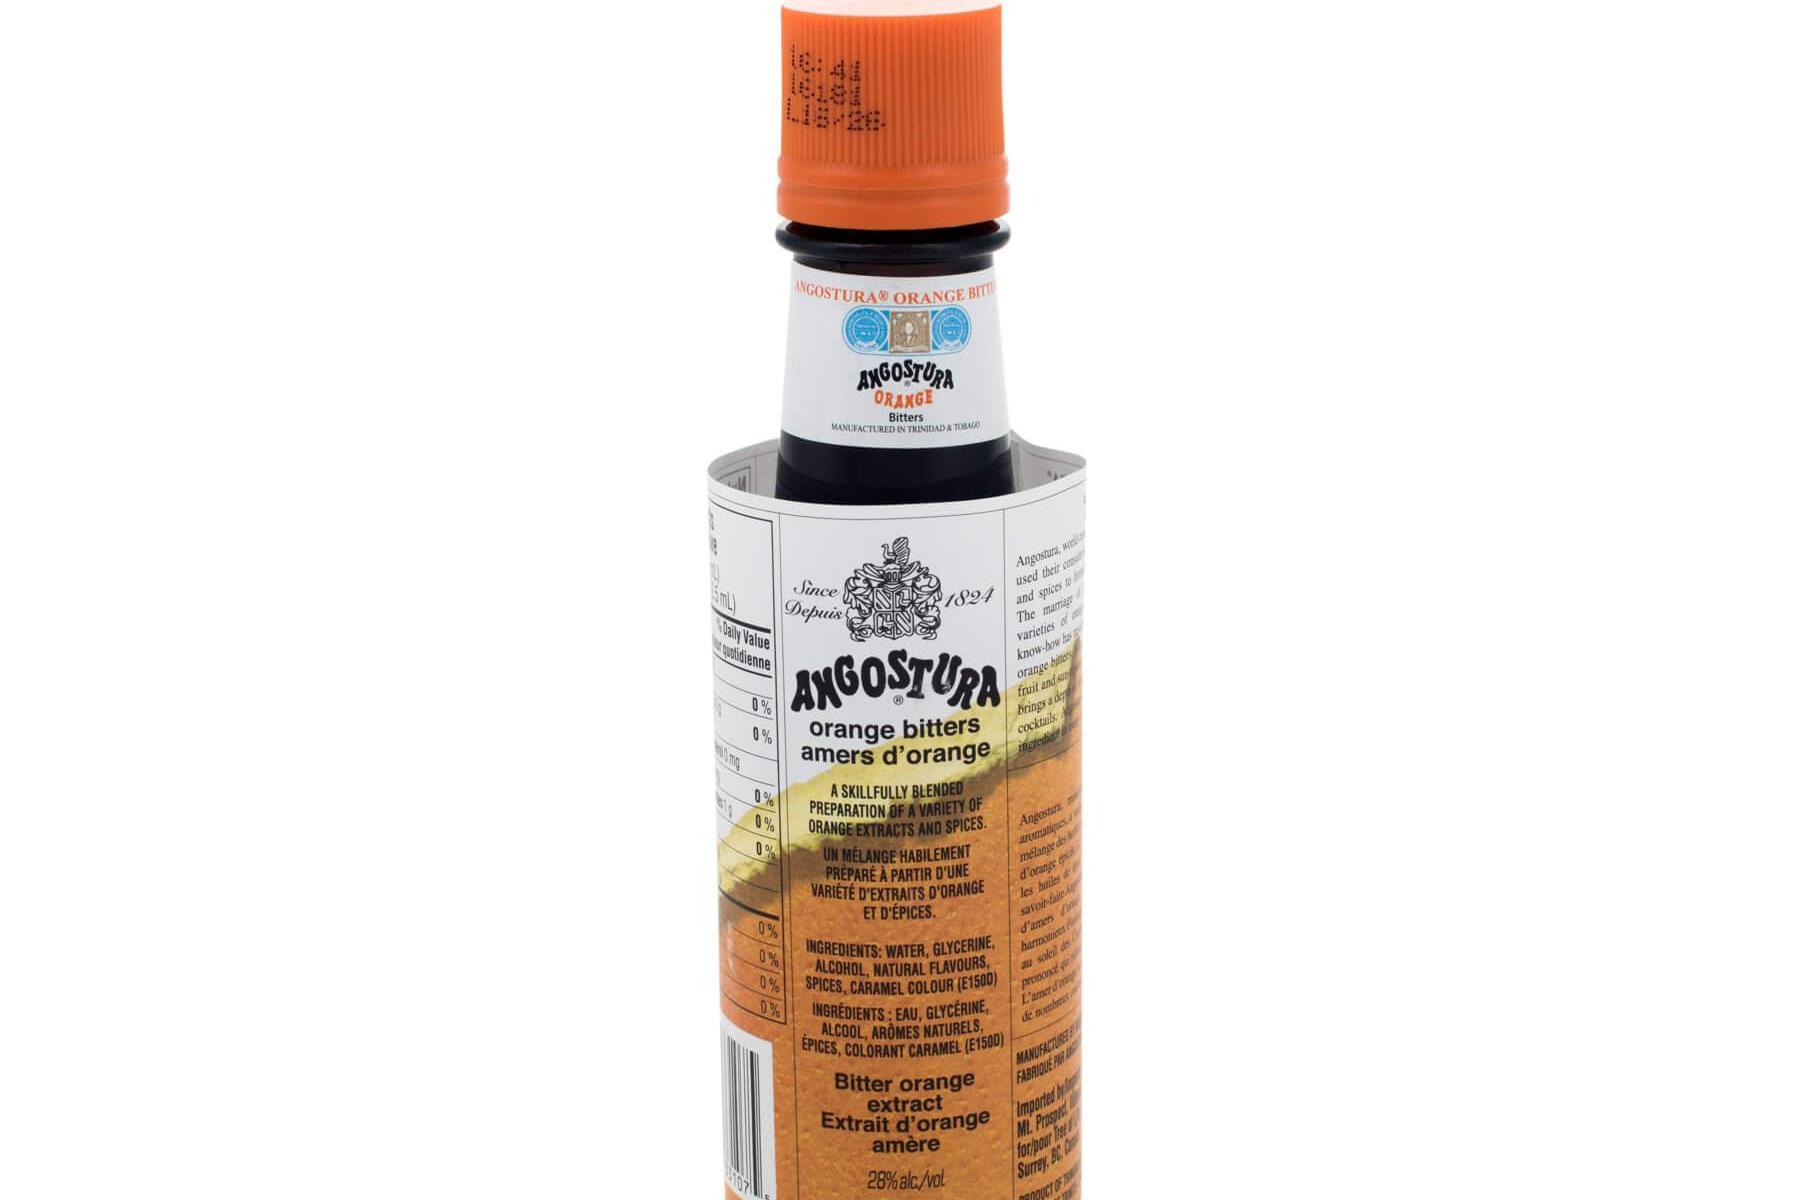 Angostura Orange Bitters (100 ml)